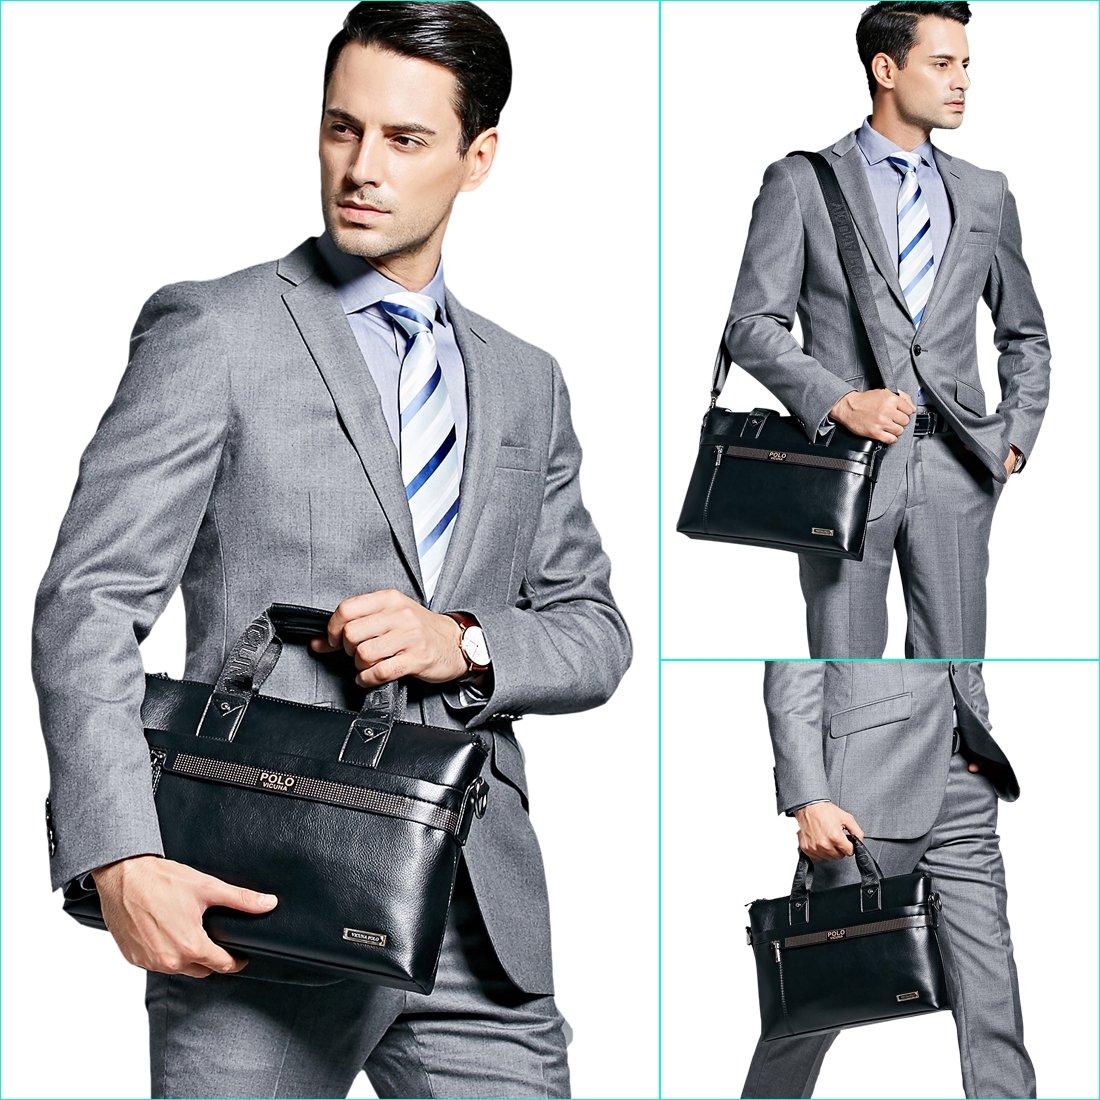 VICUNA POLO Men Briefcase Bag Business Bag Leather Laptop Bag Man Bag Handbag (black for 15.6inch) by VICUNA POLO (Image #7)